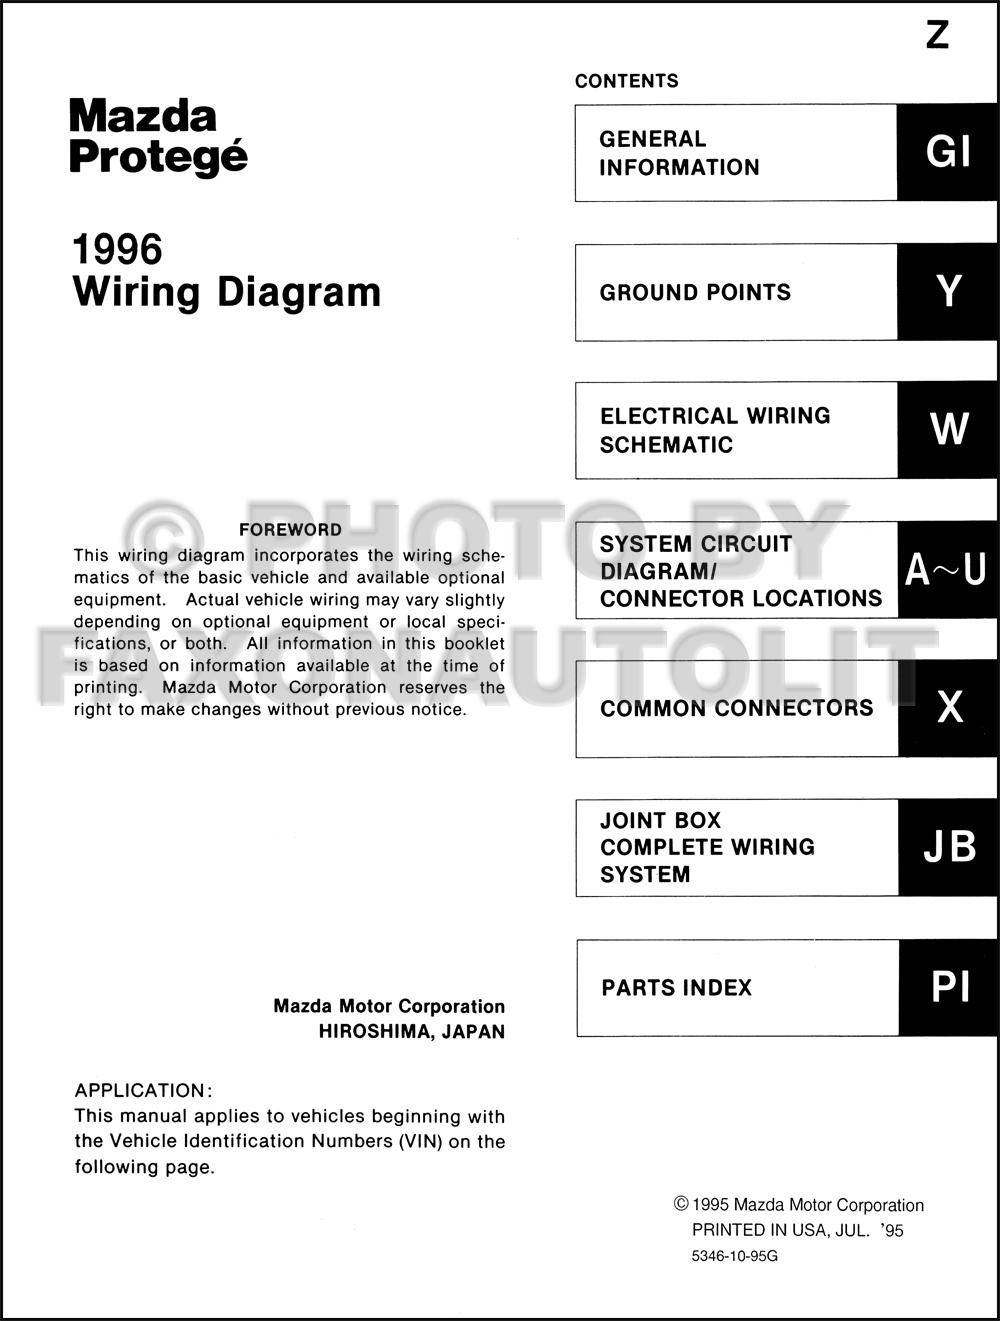 mazda protege radio wiring diagram - free download wiring diagrams, Wiring diagram